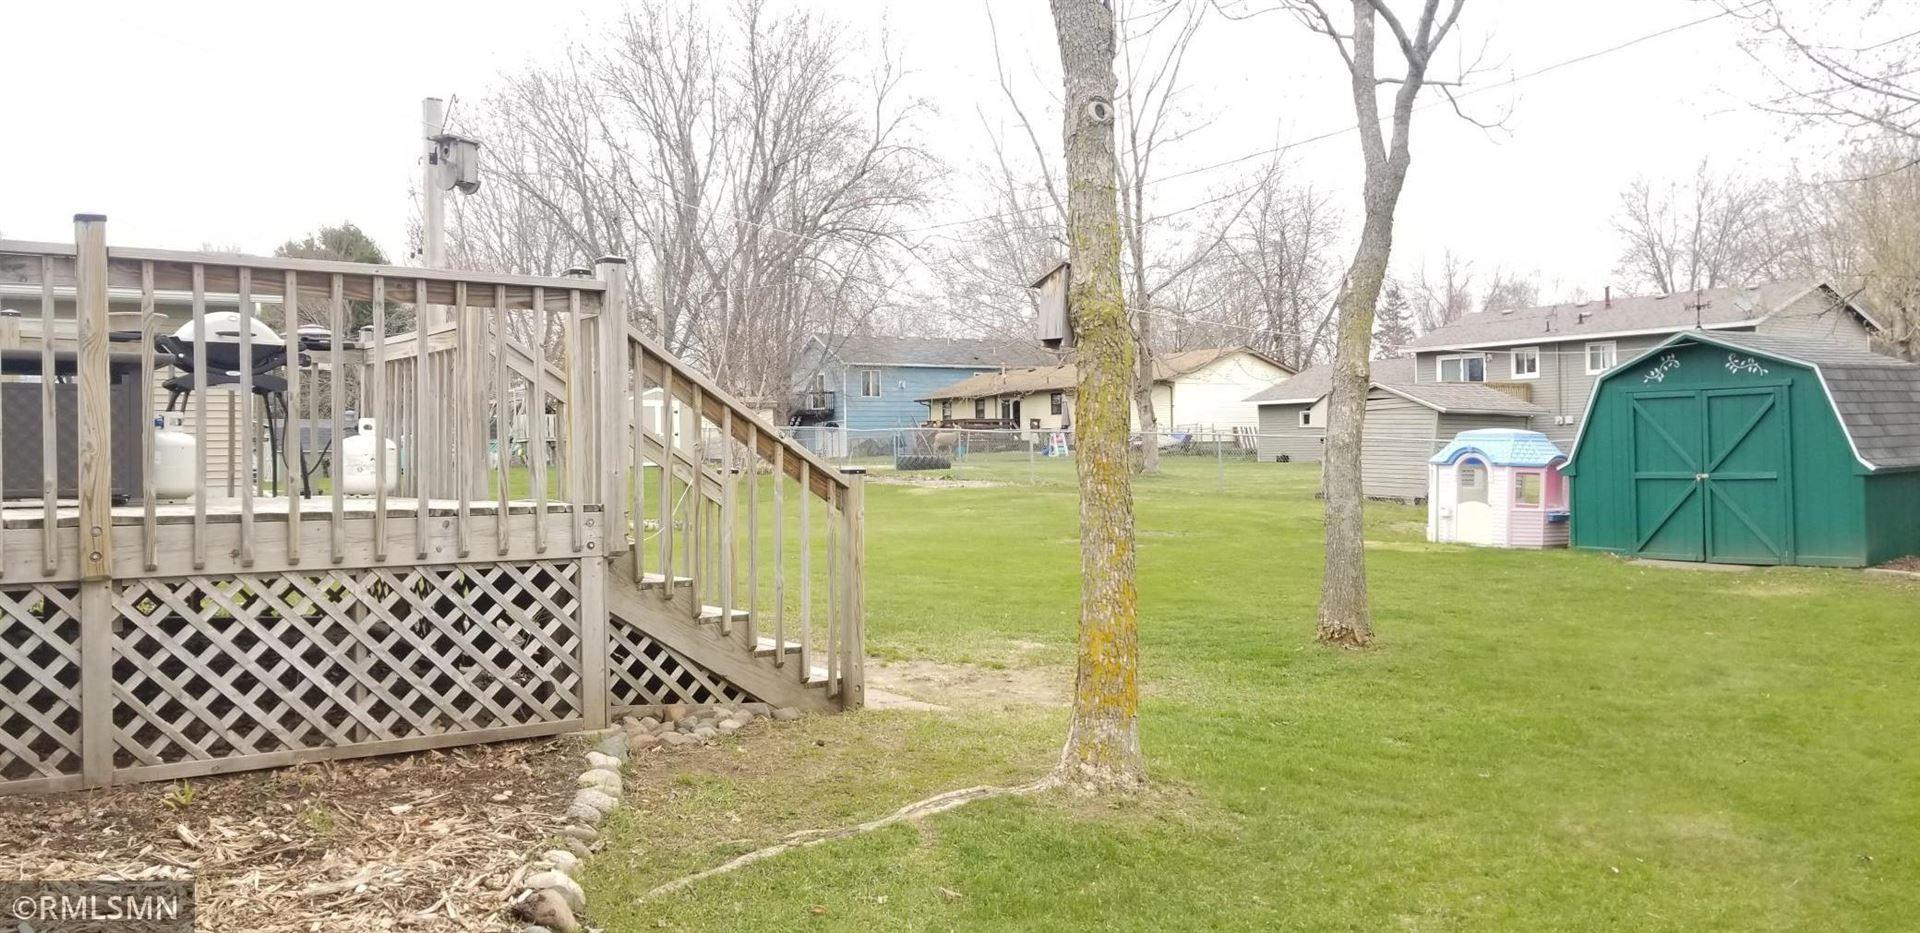 Photo of 269 Birch Drive, Foley, MN 56329 (MLS # 5745311)